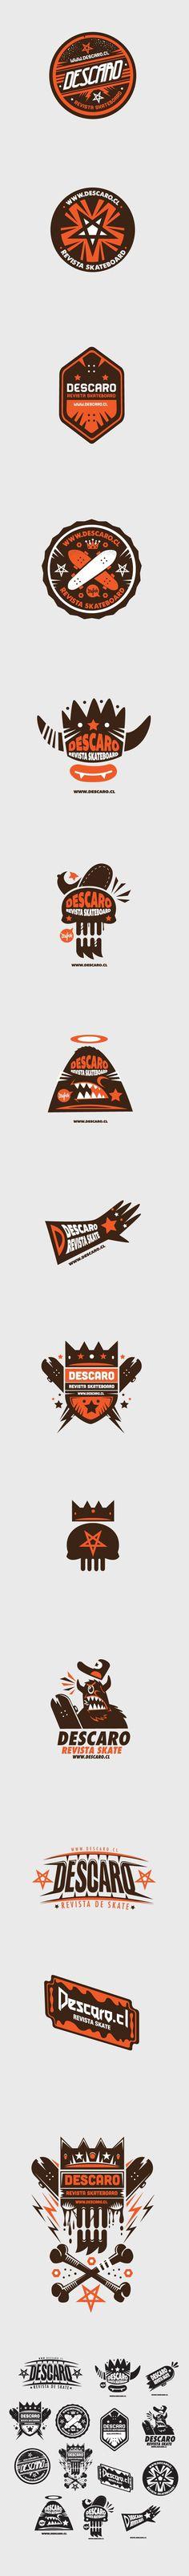 Logo collection Descaro skate Magazine by New Fren #design #graphic